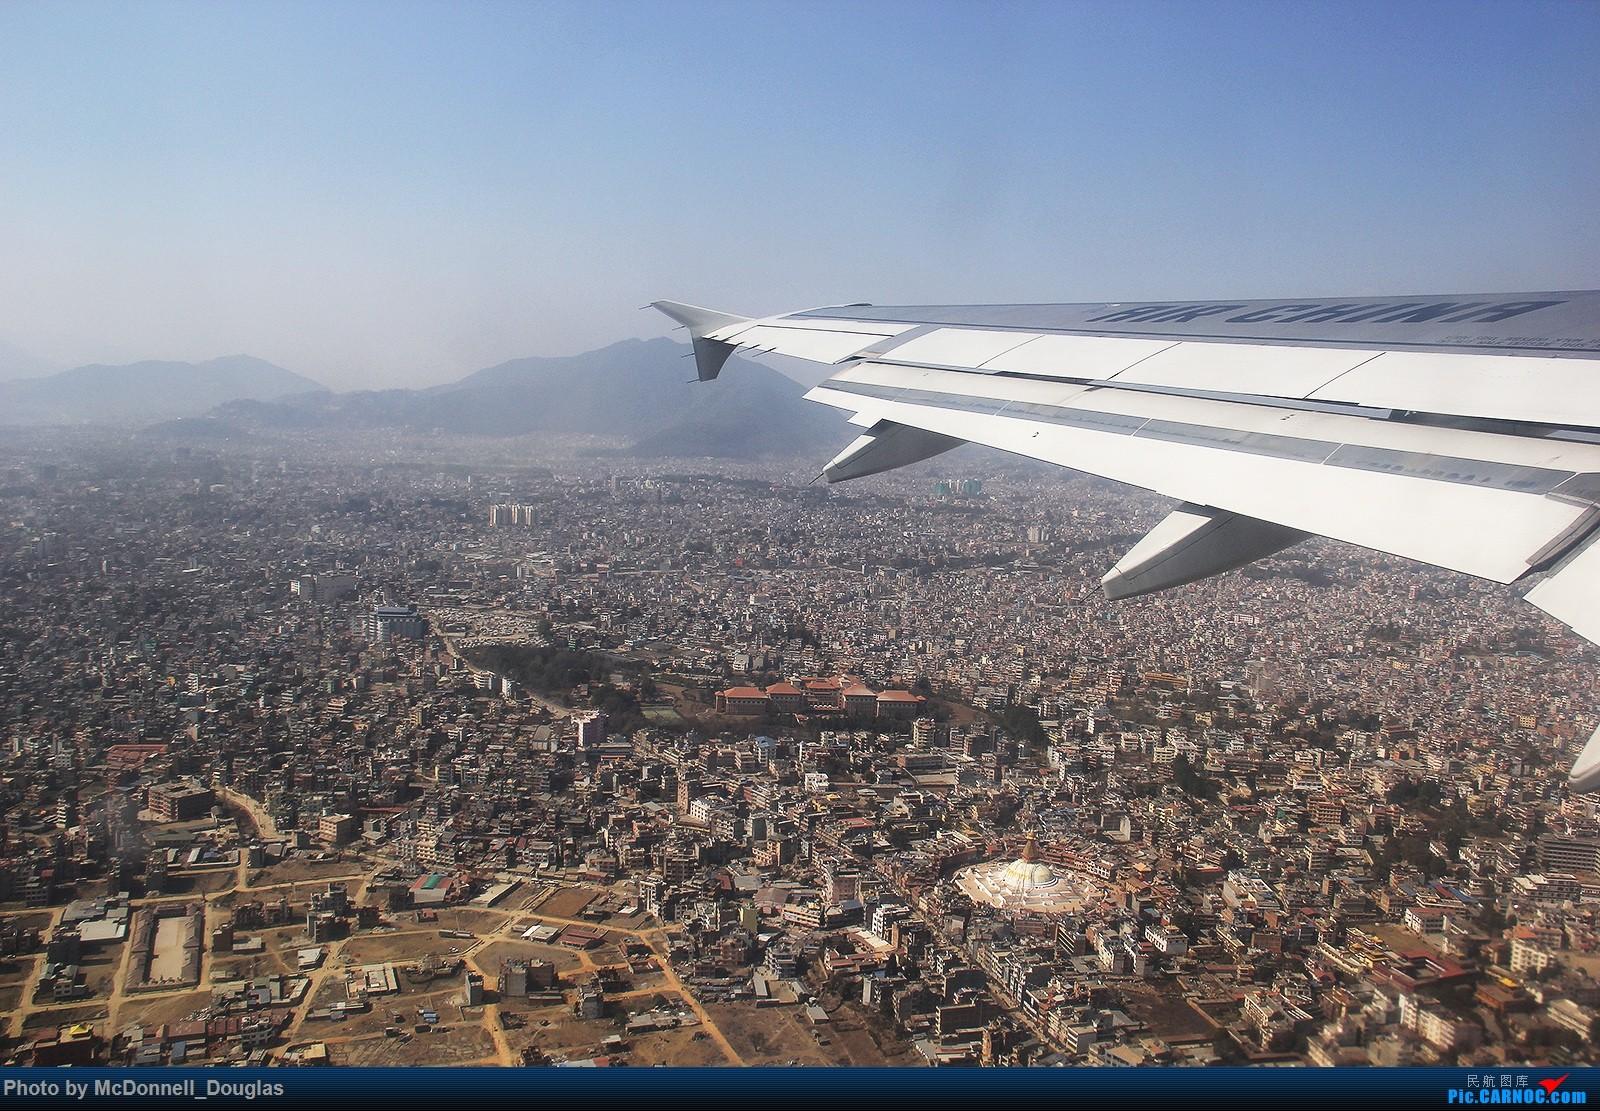 Re:[原创]【上海飞友会】【zc带你游天下(4)】不远千里飞跃喜马拉雅去看你,探寻高山另一边的神秘国度,和一群贫穷却快乐着的人们 AIRBUS A319-115 B-6238